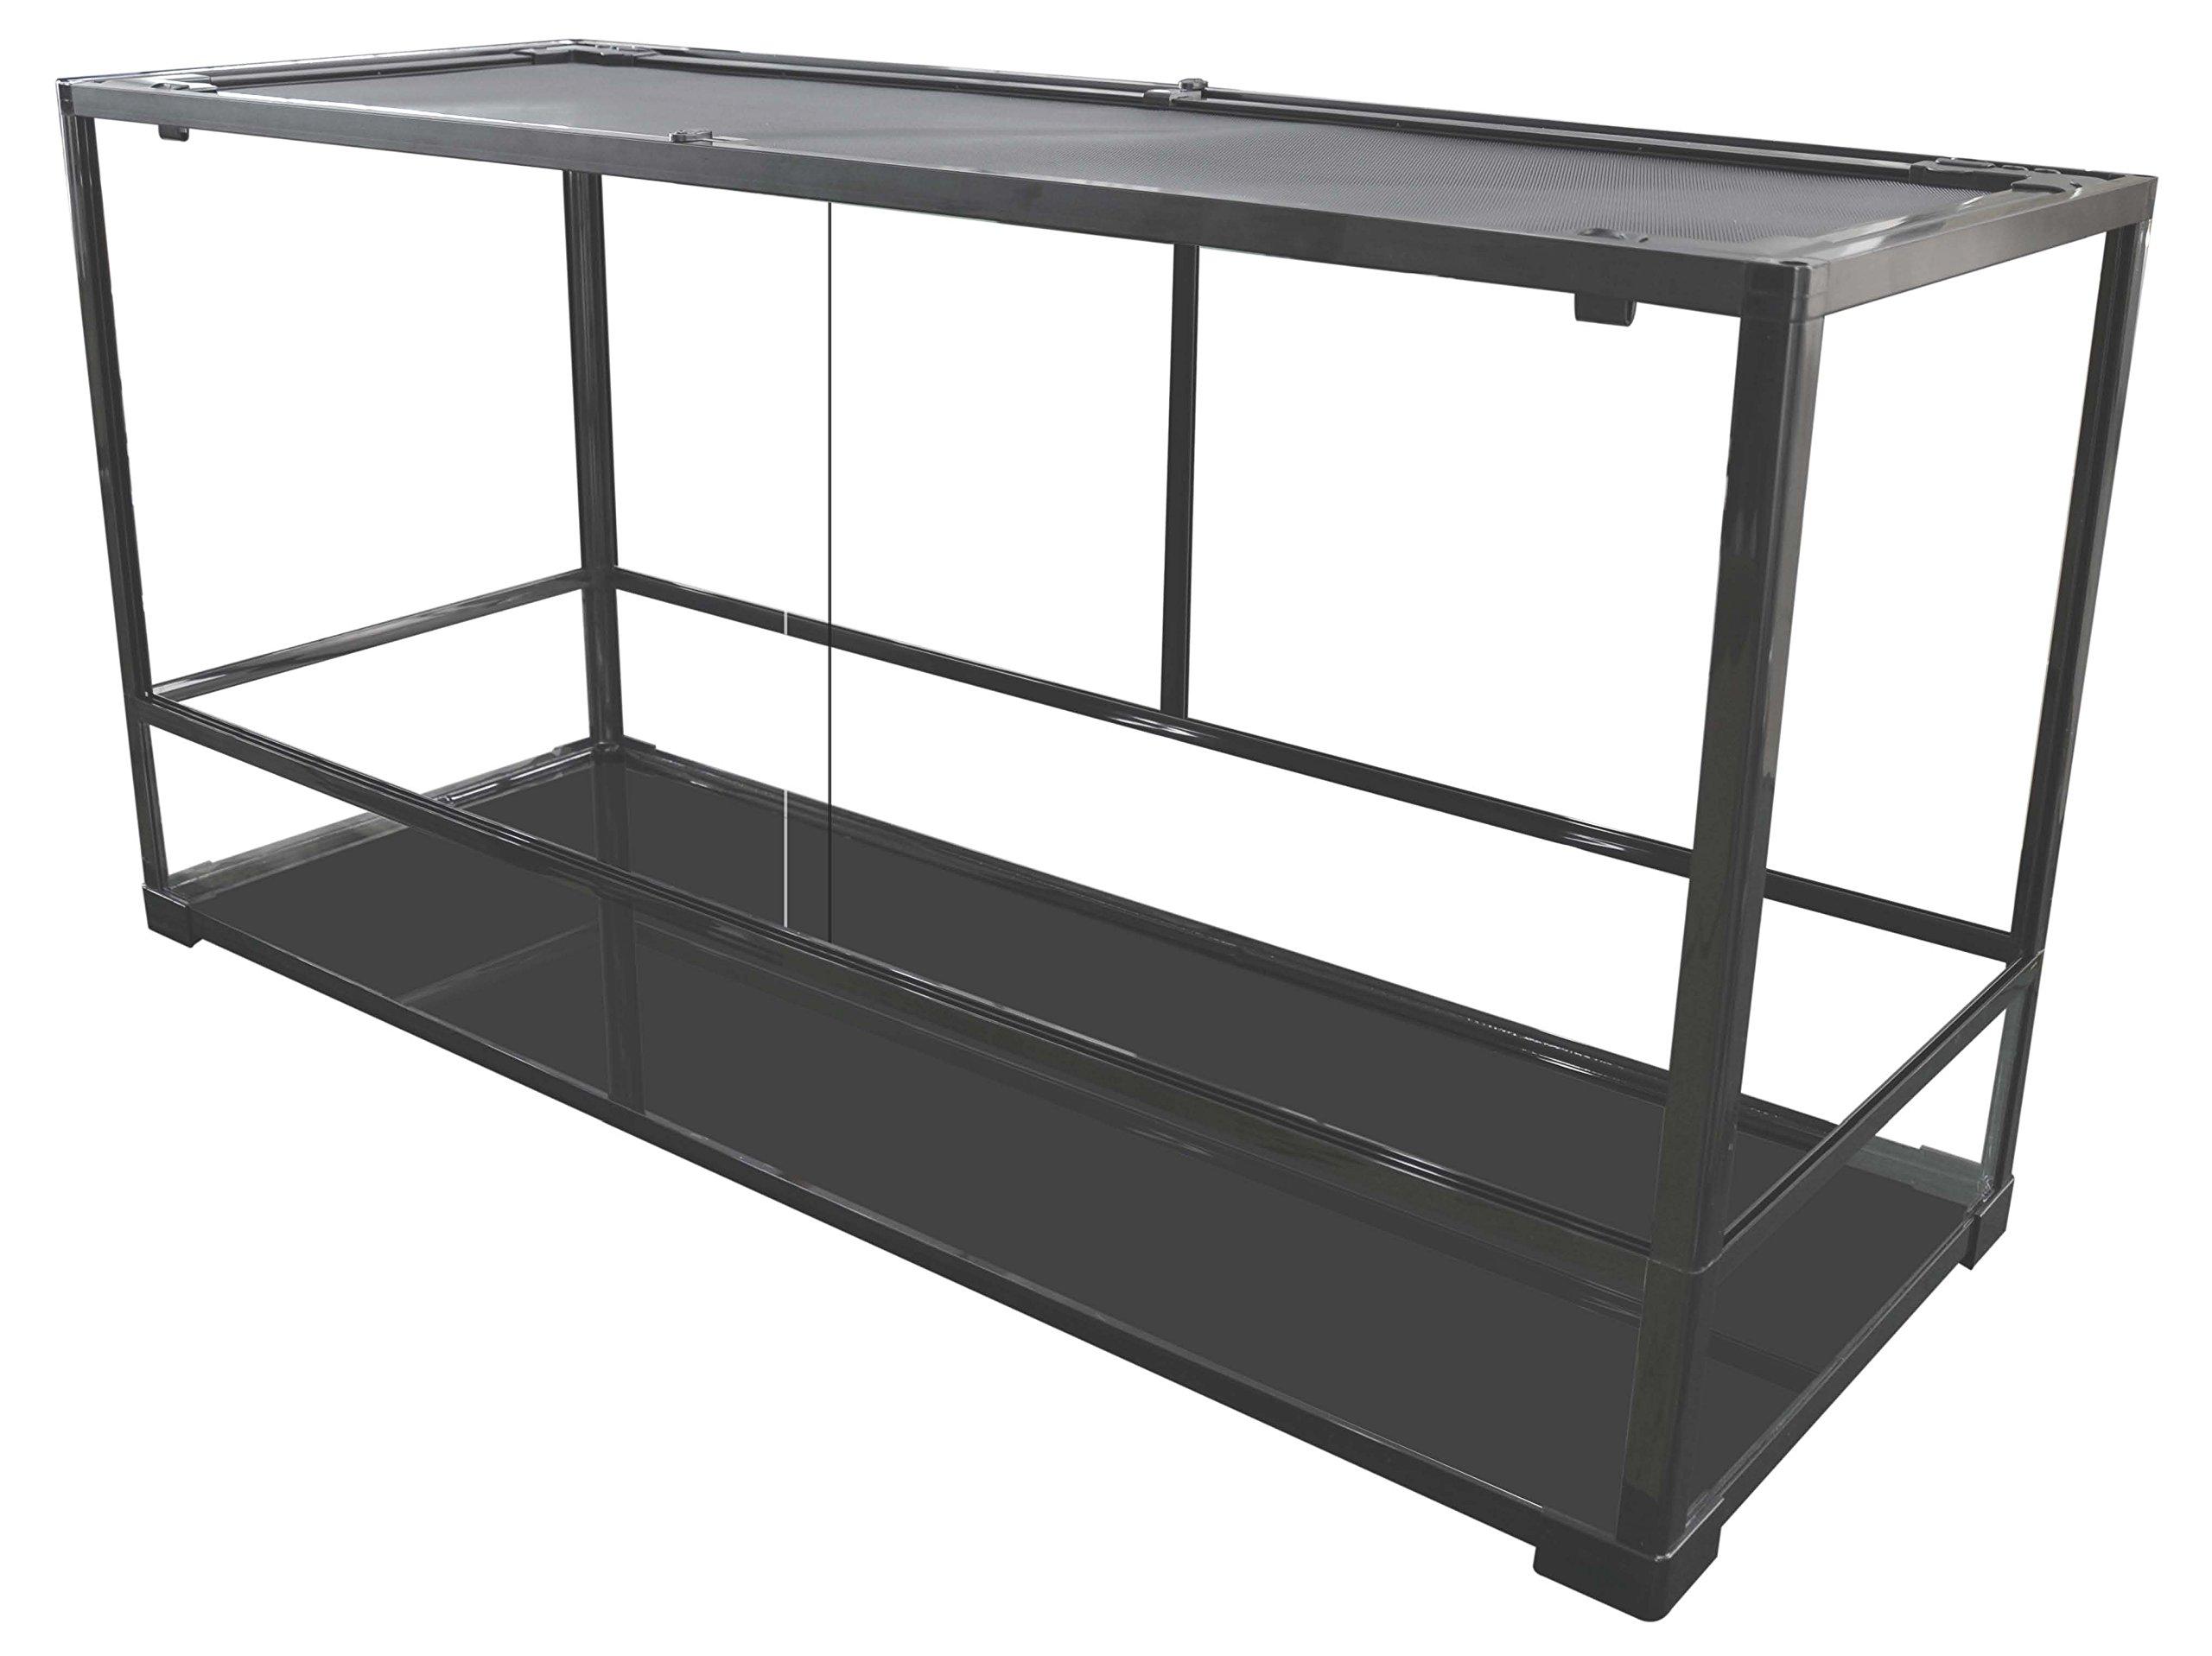 Carolina Custom Cages Terrarium, Tall Extra-Long 48x18x24, Easy Assembly